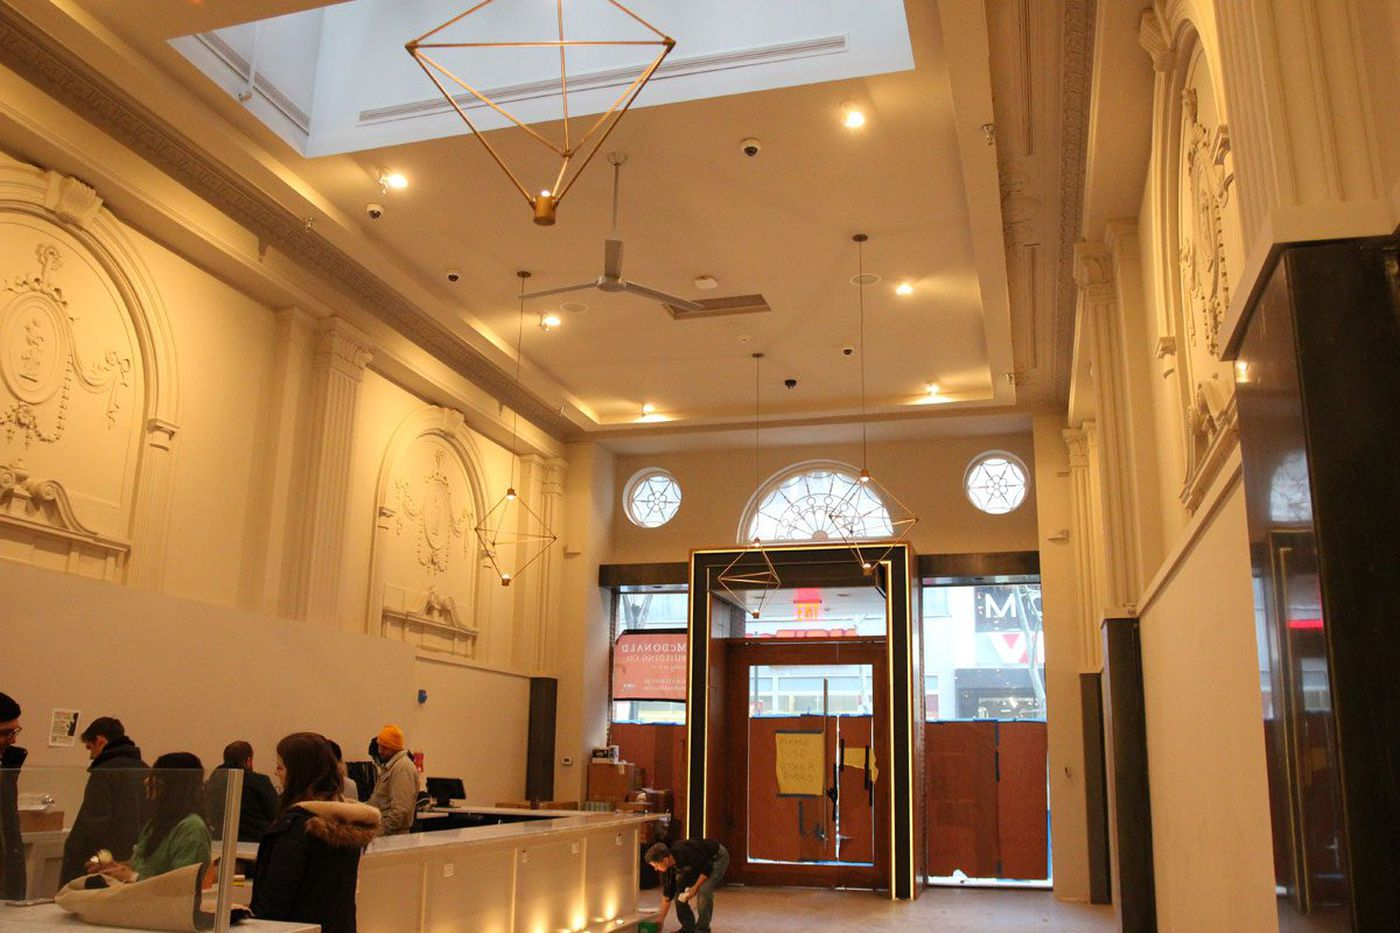 Porta, a Neapolitan pizzeria, to open in Wash West